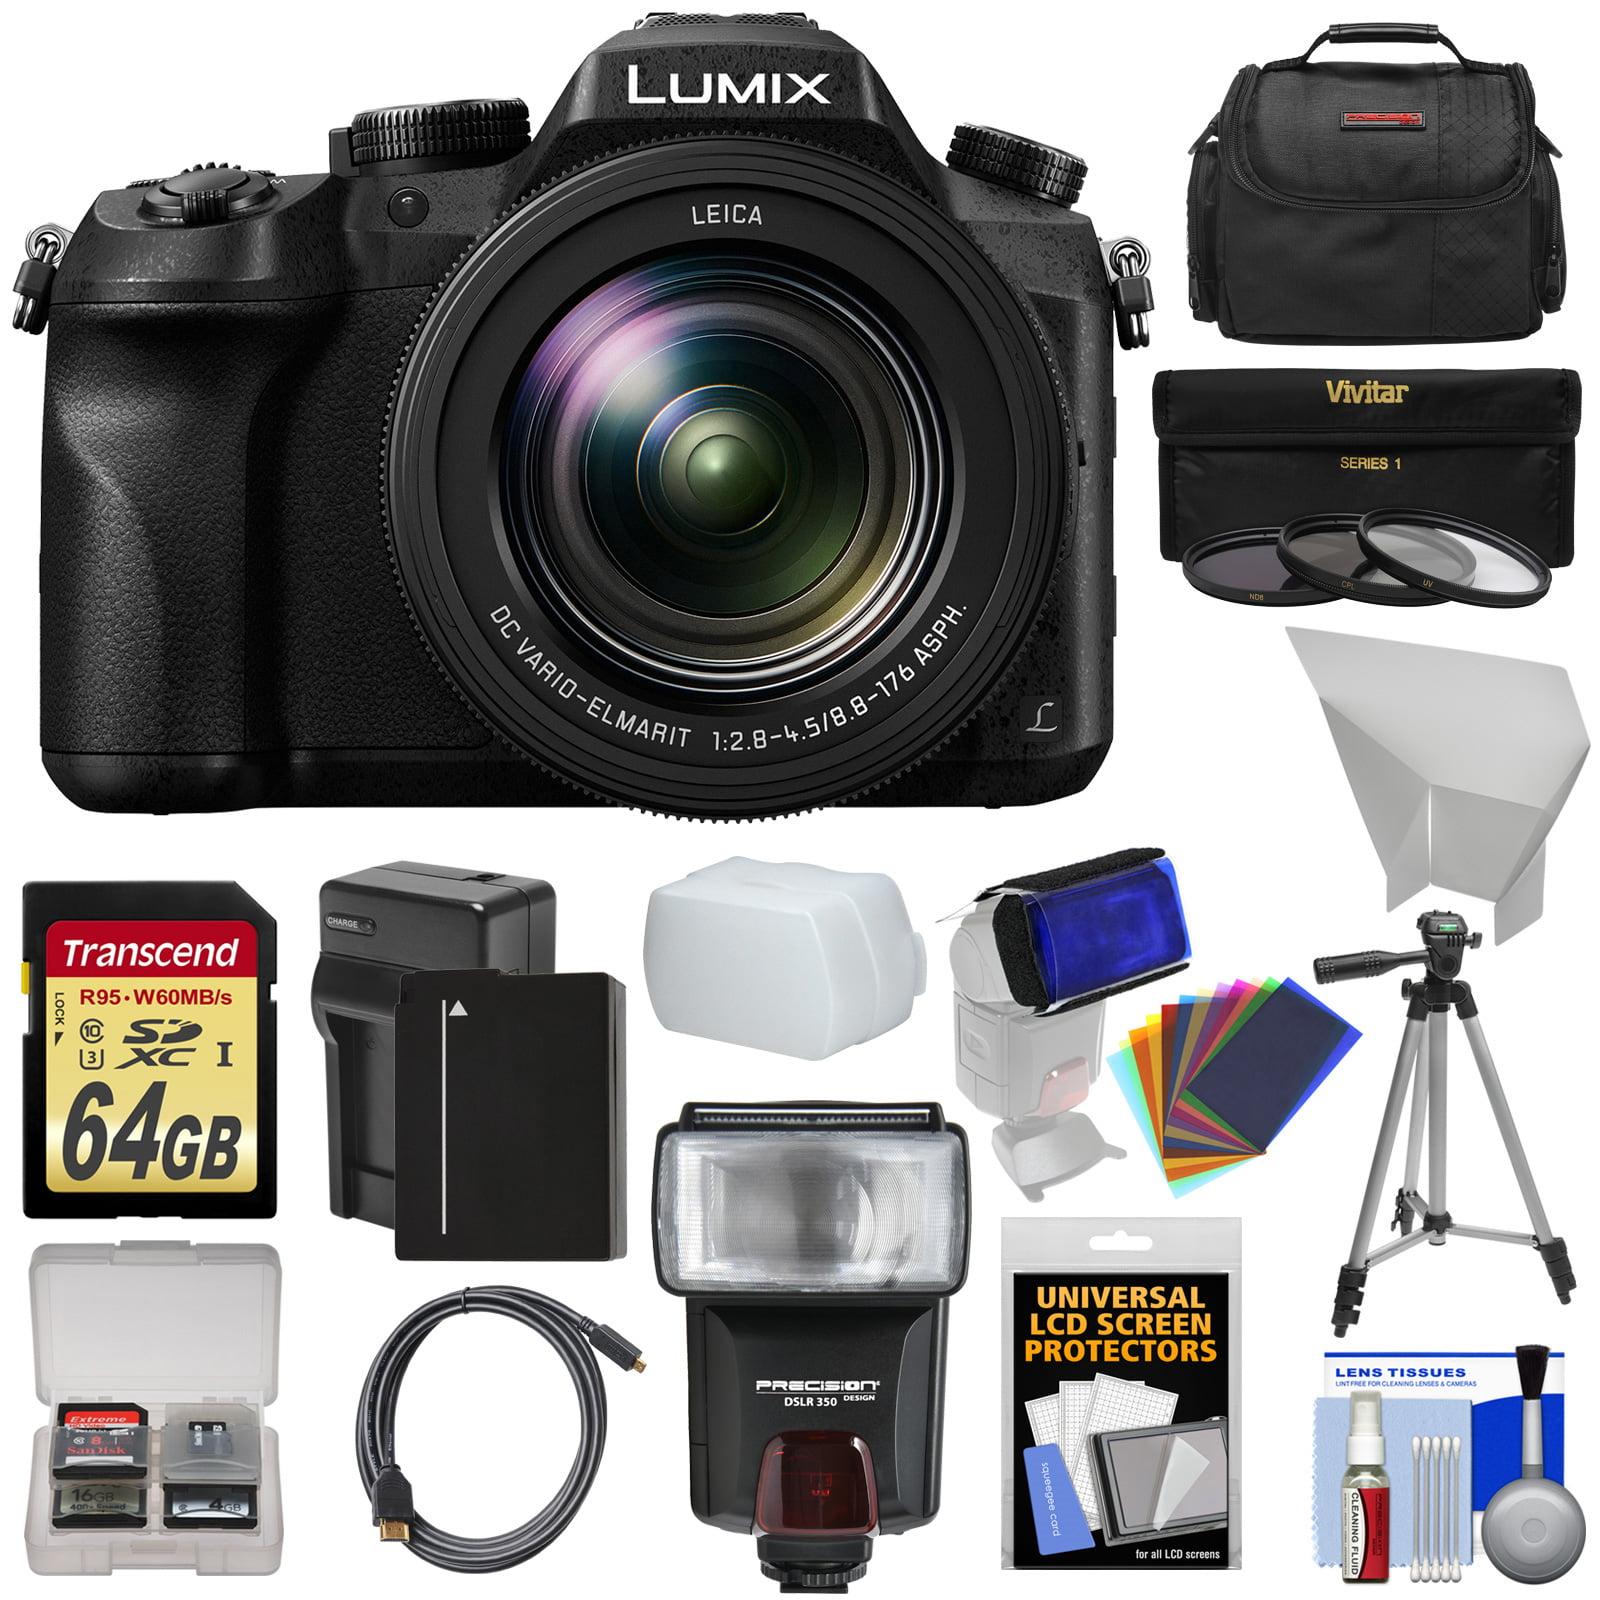 Panasonic Lumix DMC-FZ2500 4K Wi-Fi Digital Camera with 64GB Card + Battery & Charger +